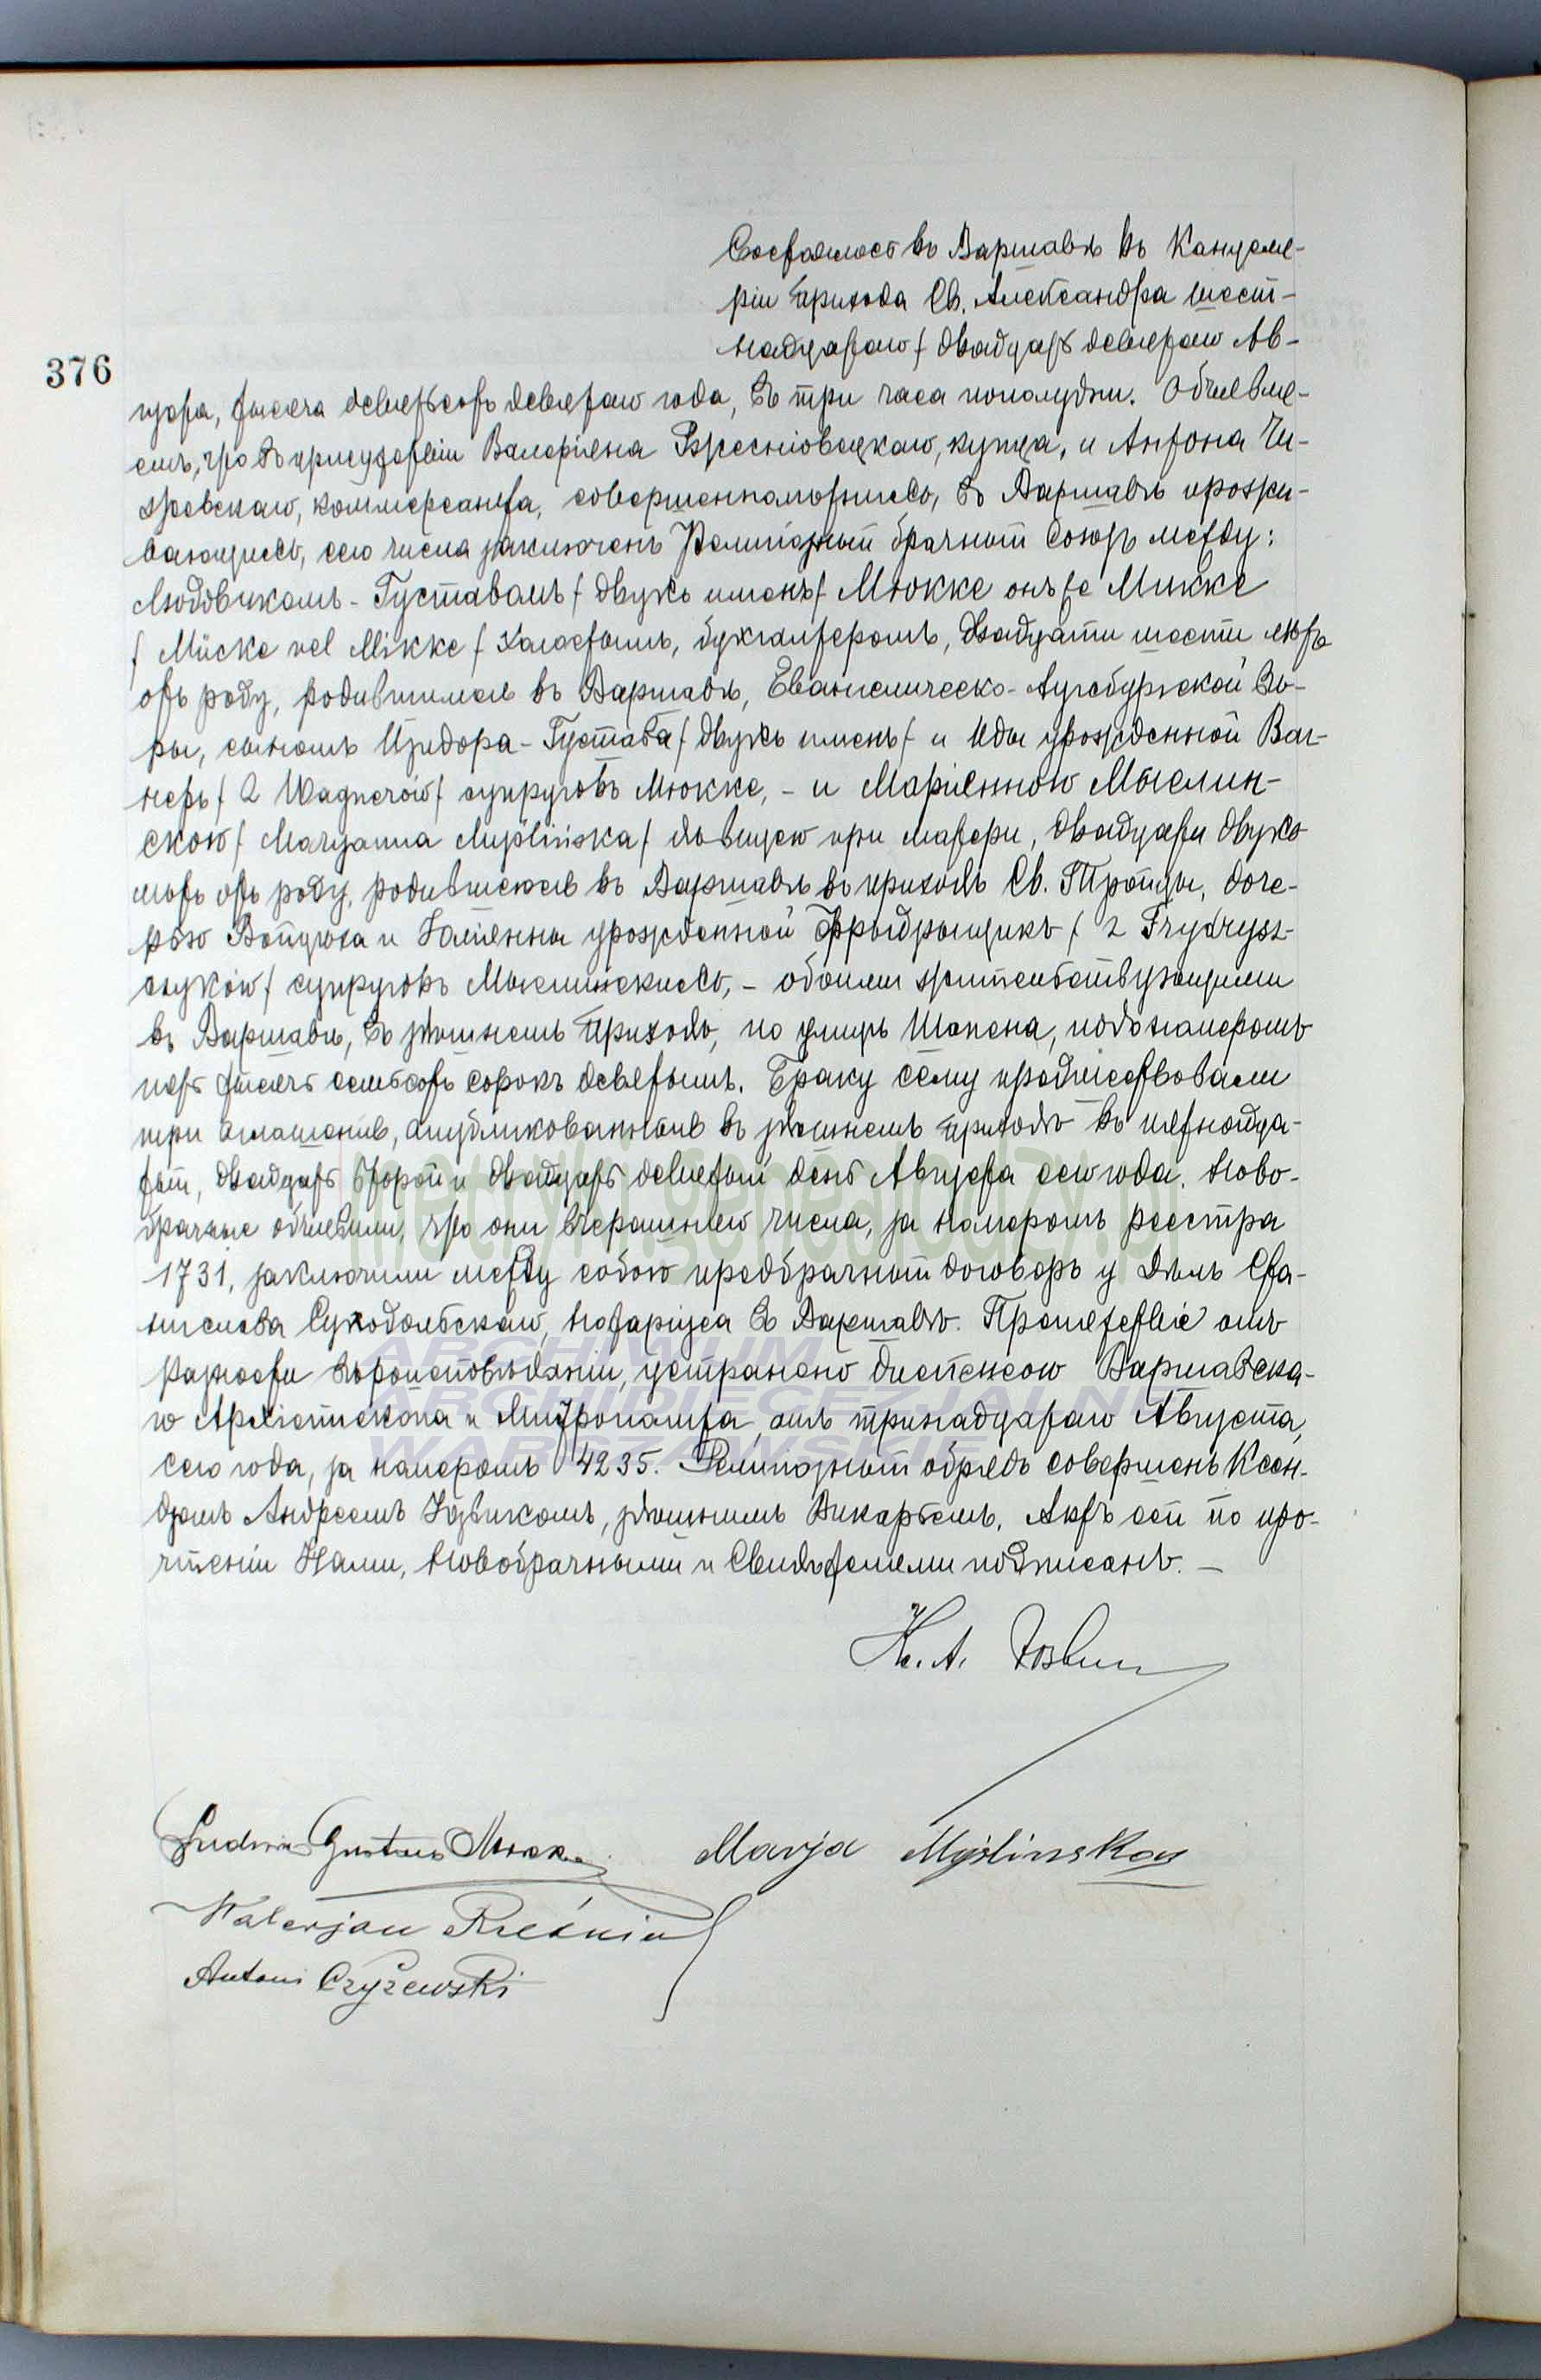 Ludwik Gustaw Mikke ślub